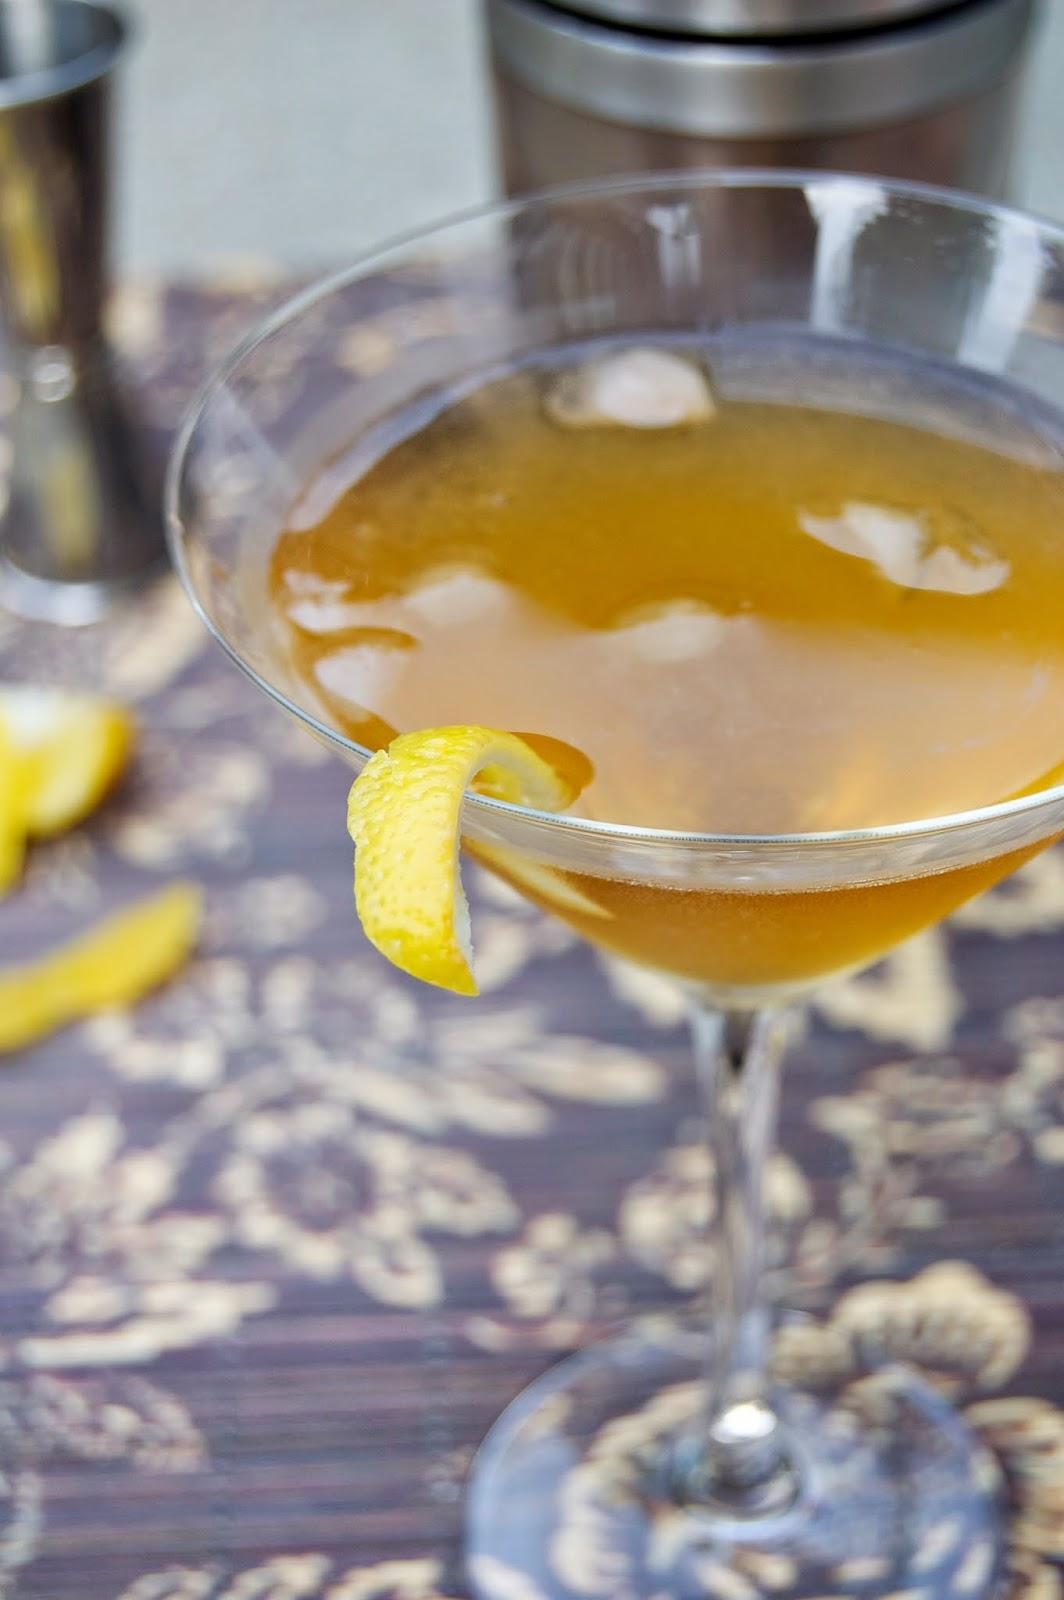 30/30 - #19 Martini | www.kettlercuisine.com